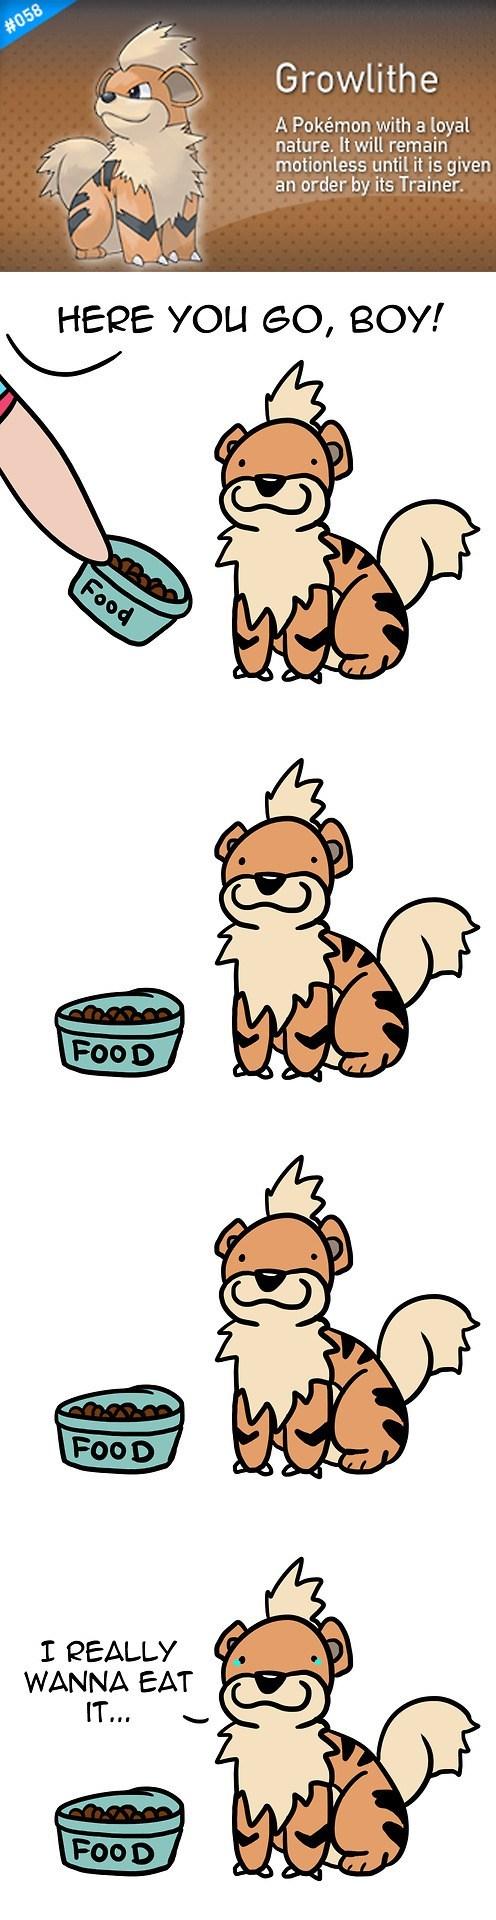 pokedex,Pokémon,growlithe,comics